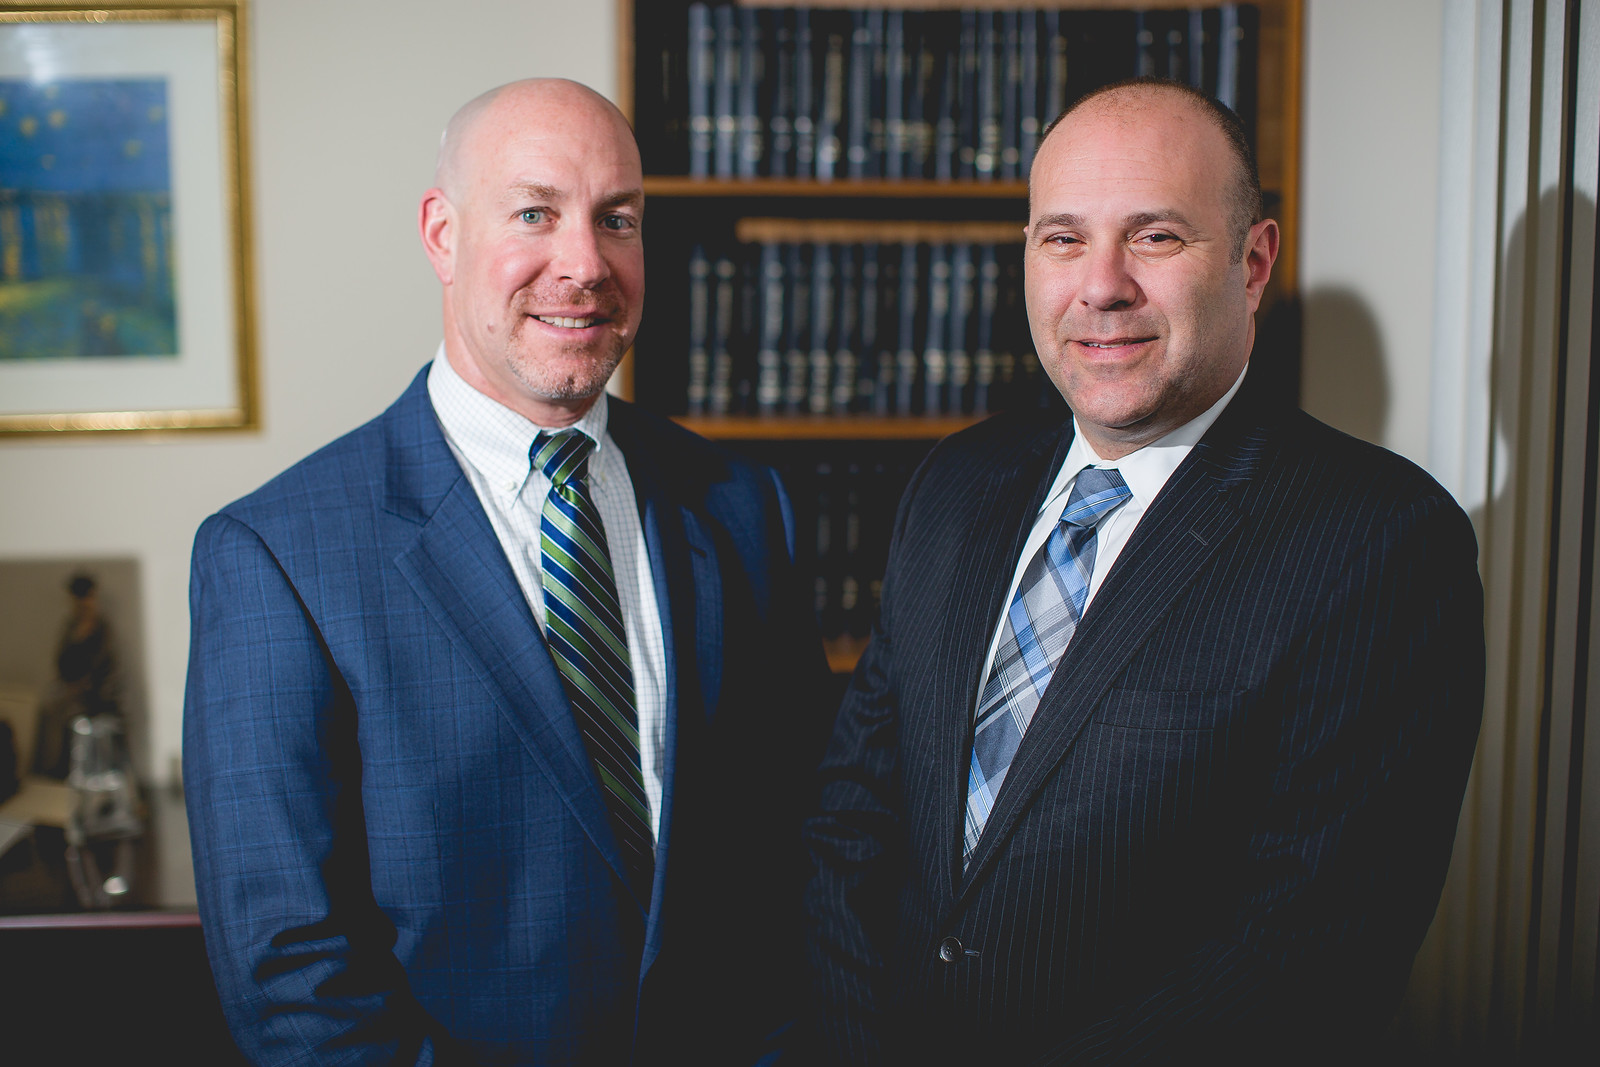 Glenn Riegler & David Berkowitz Law Partners Melville New York Photos